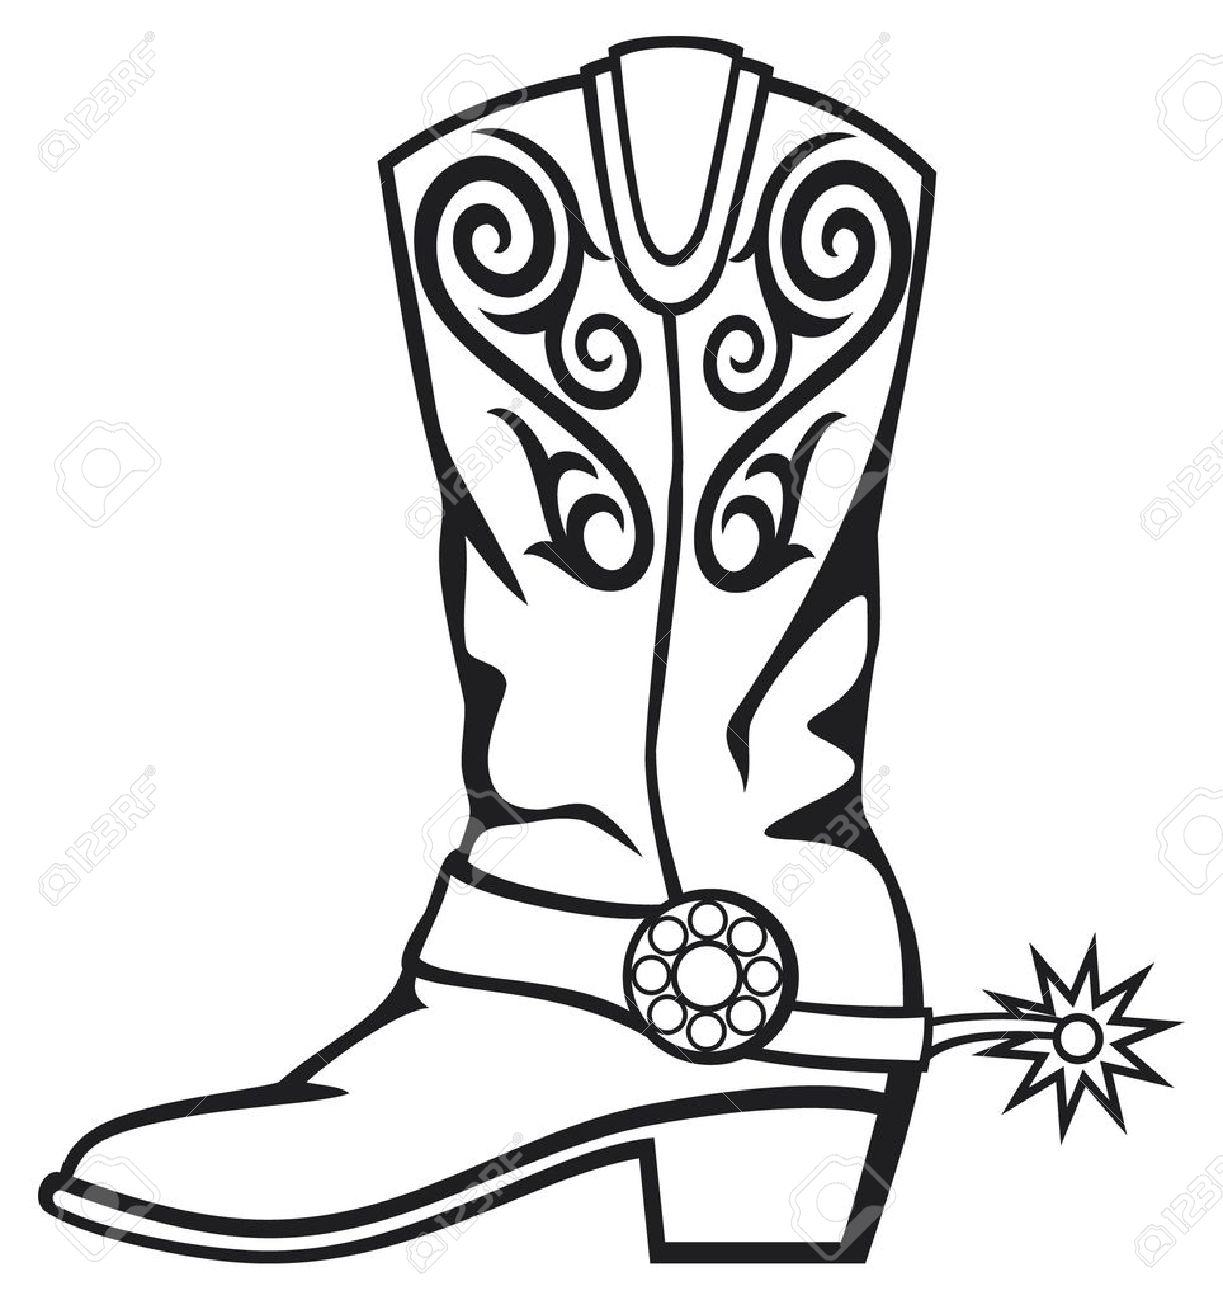 Cowboy clipart cowboy boot. Western drawing at getdrawings